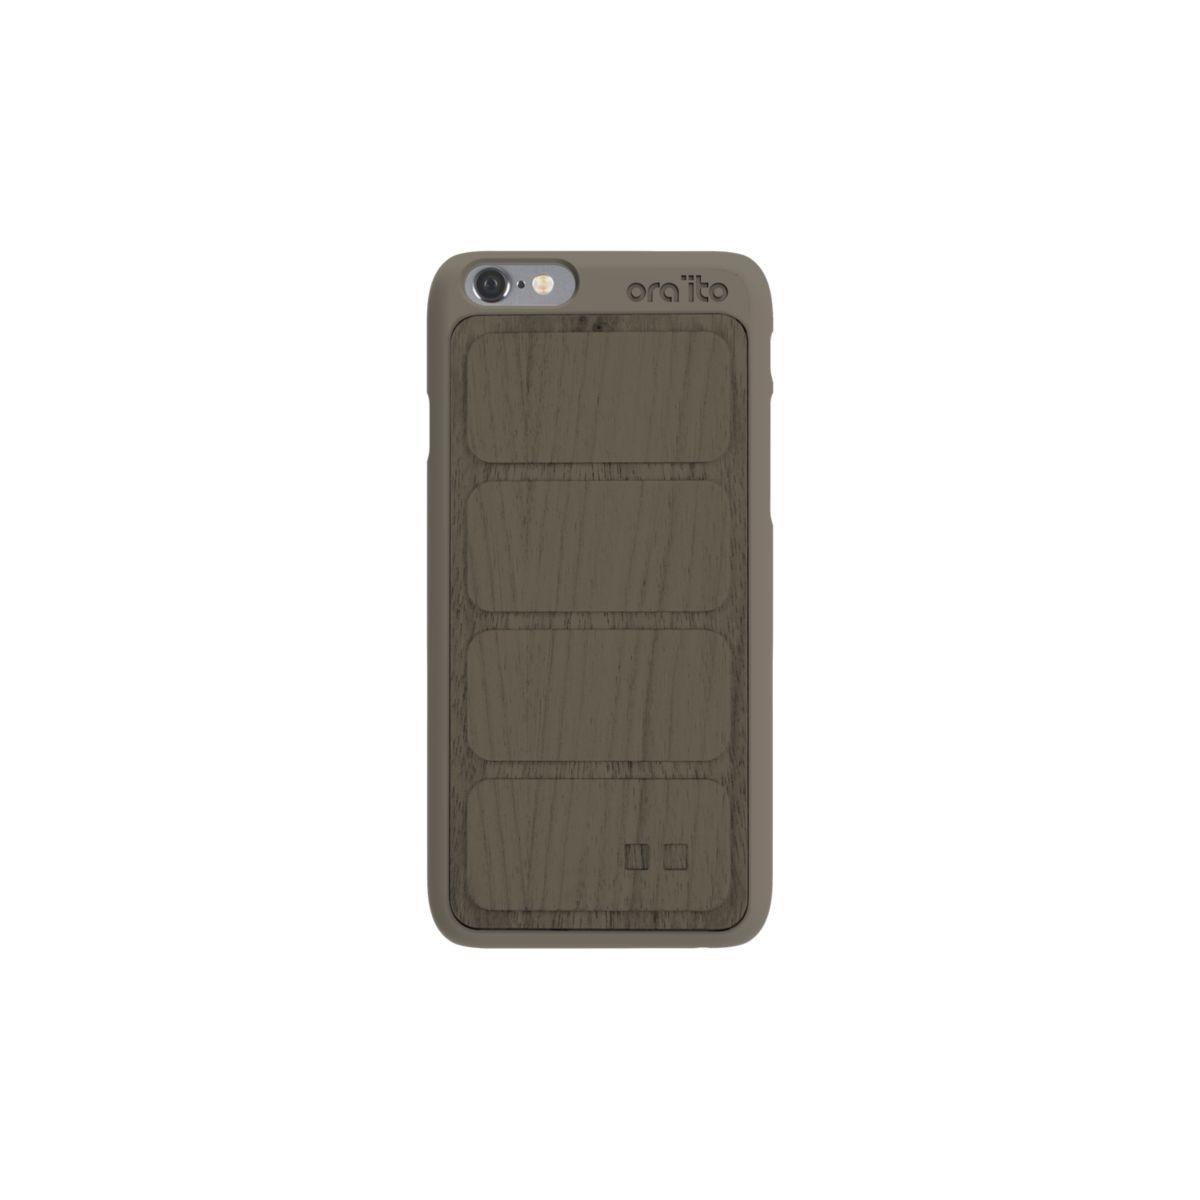 Coque ORA ITO iPhone 6/6s en bois gris